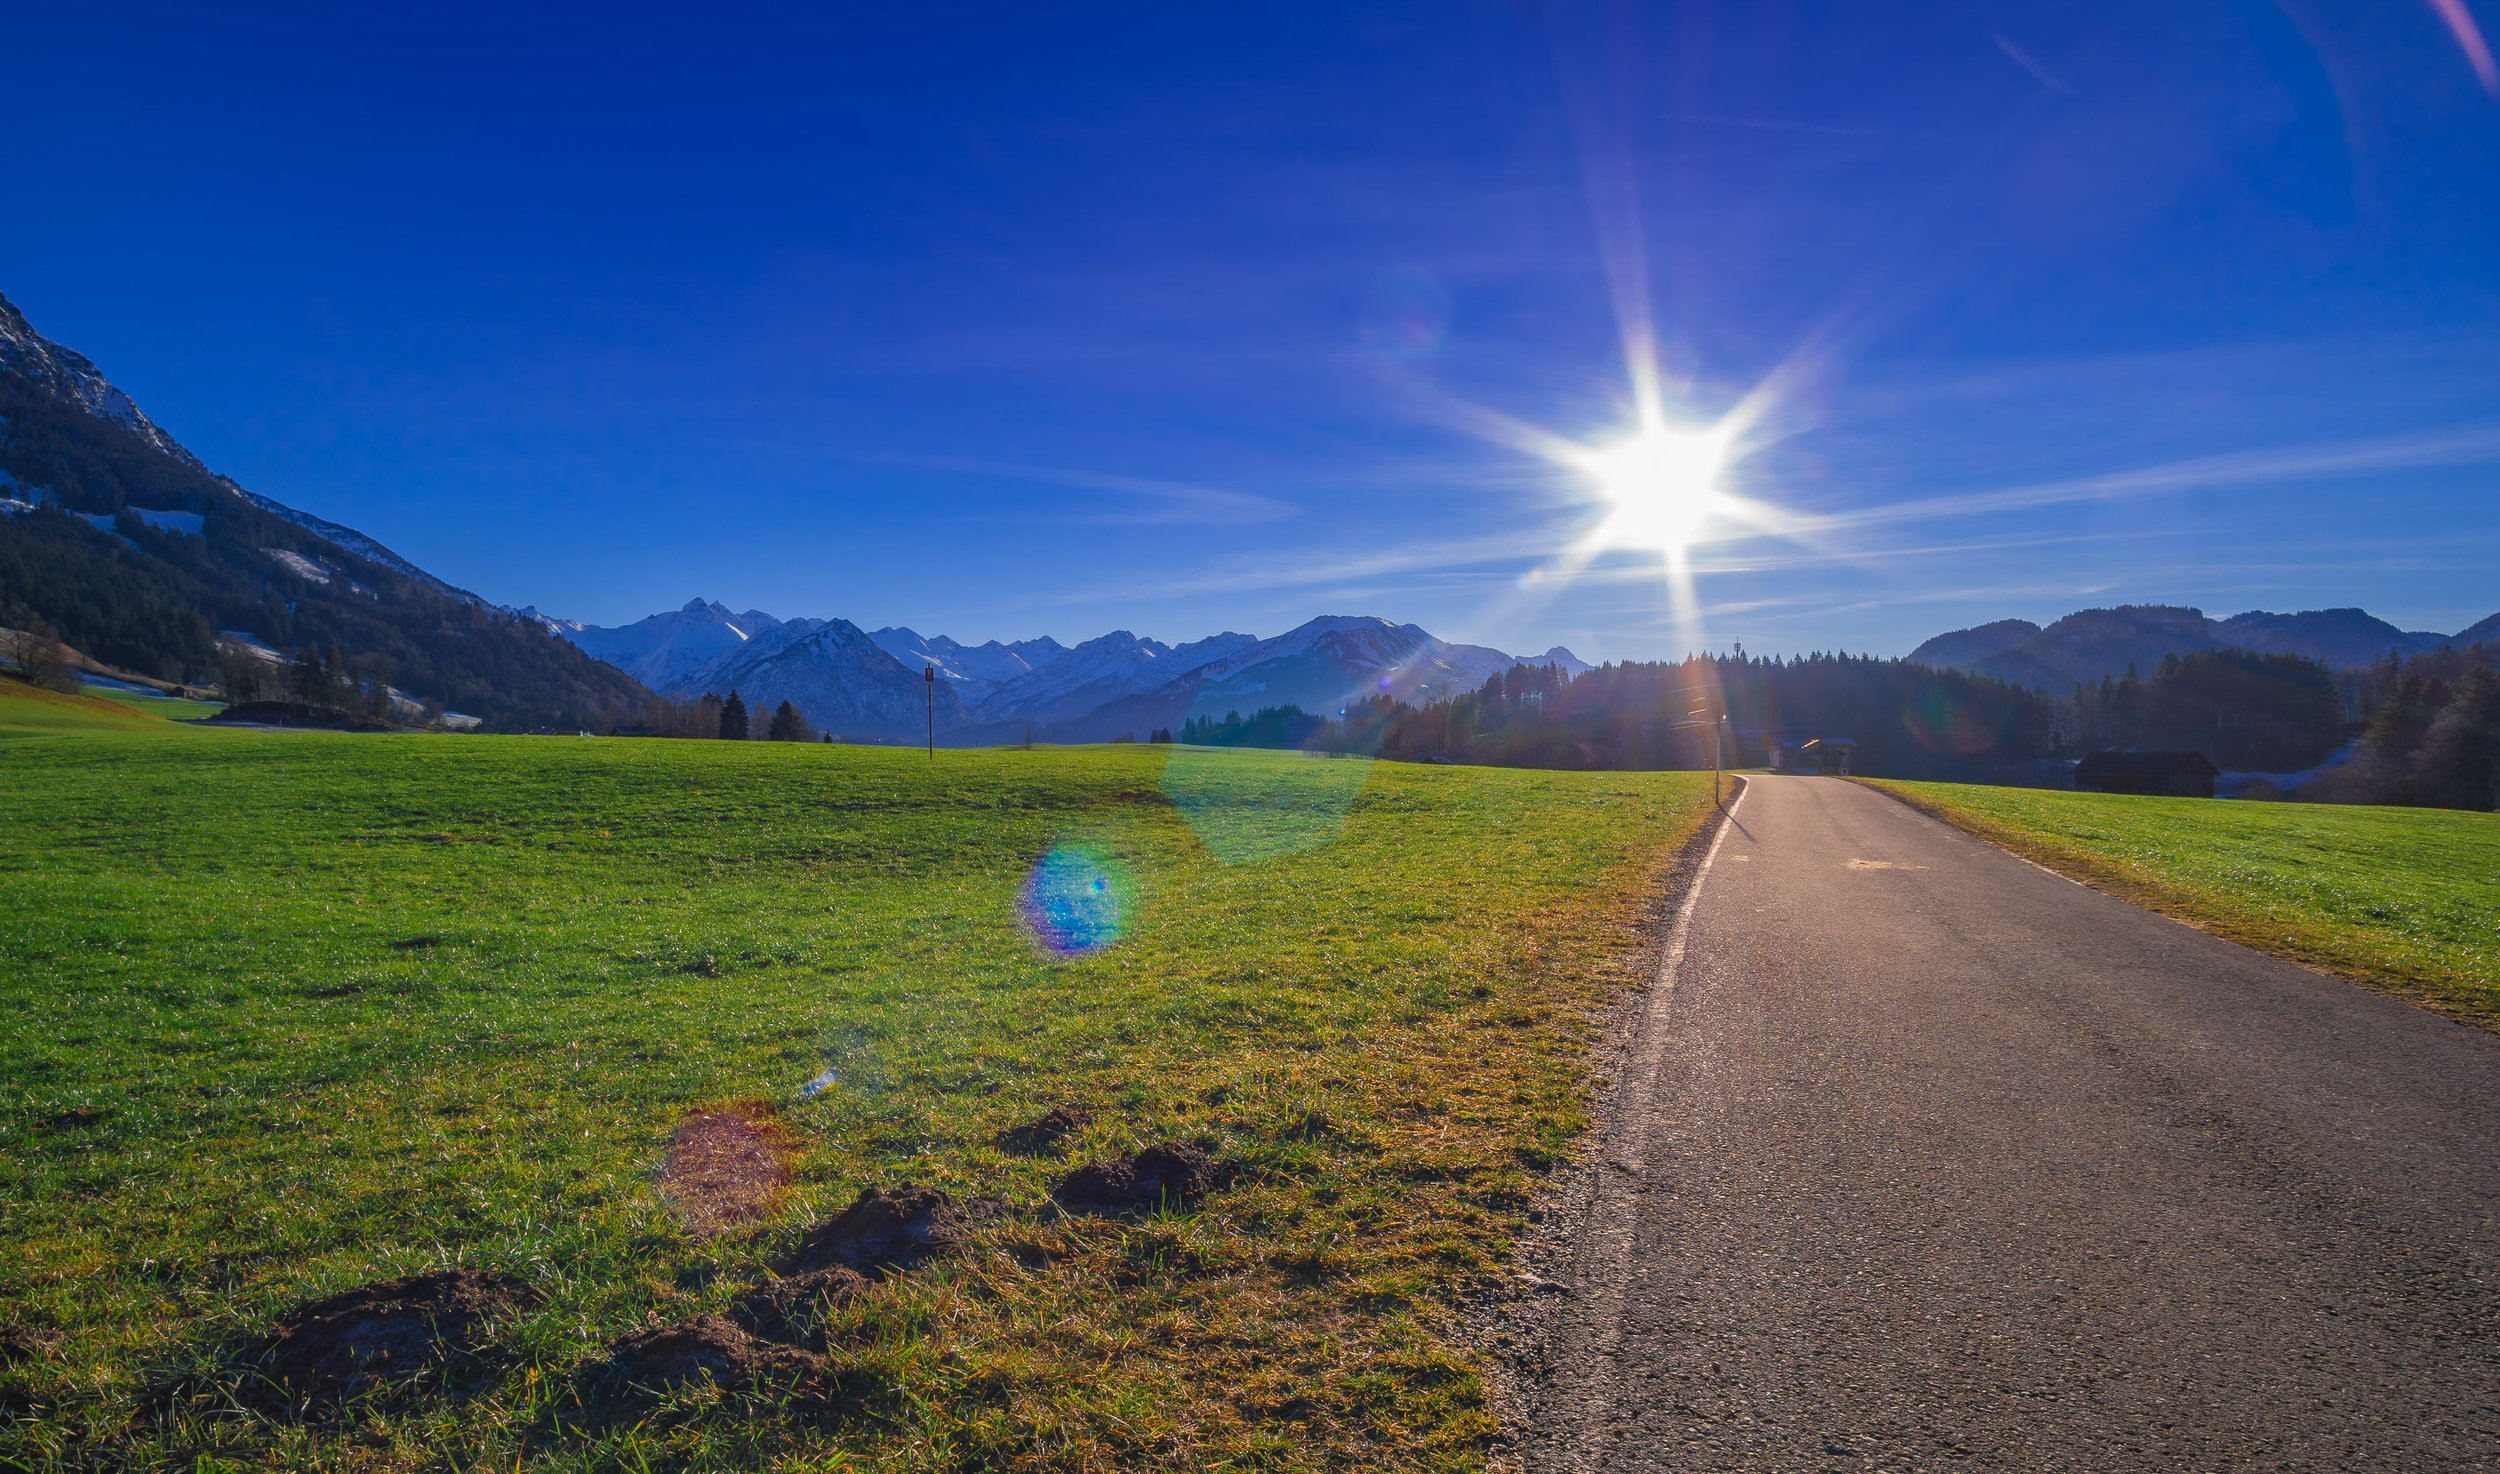 sunny_road.jpg